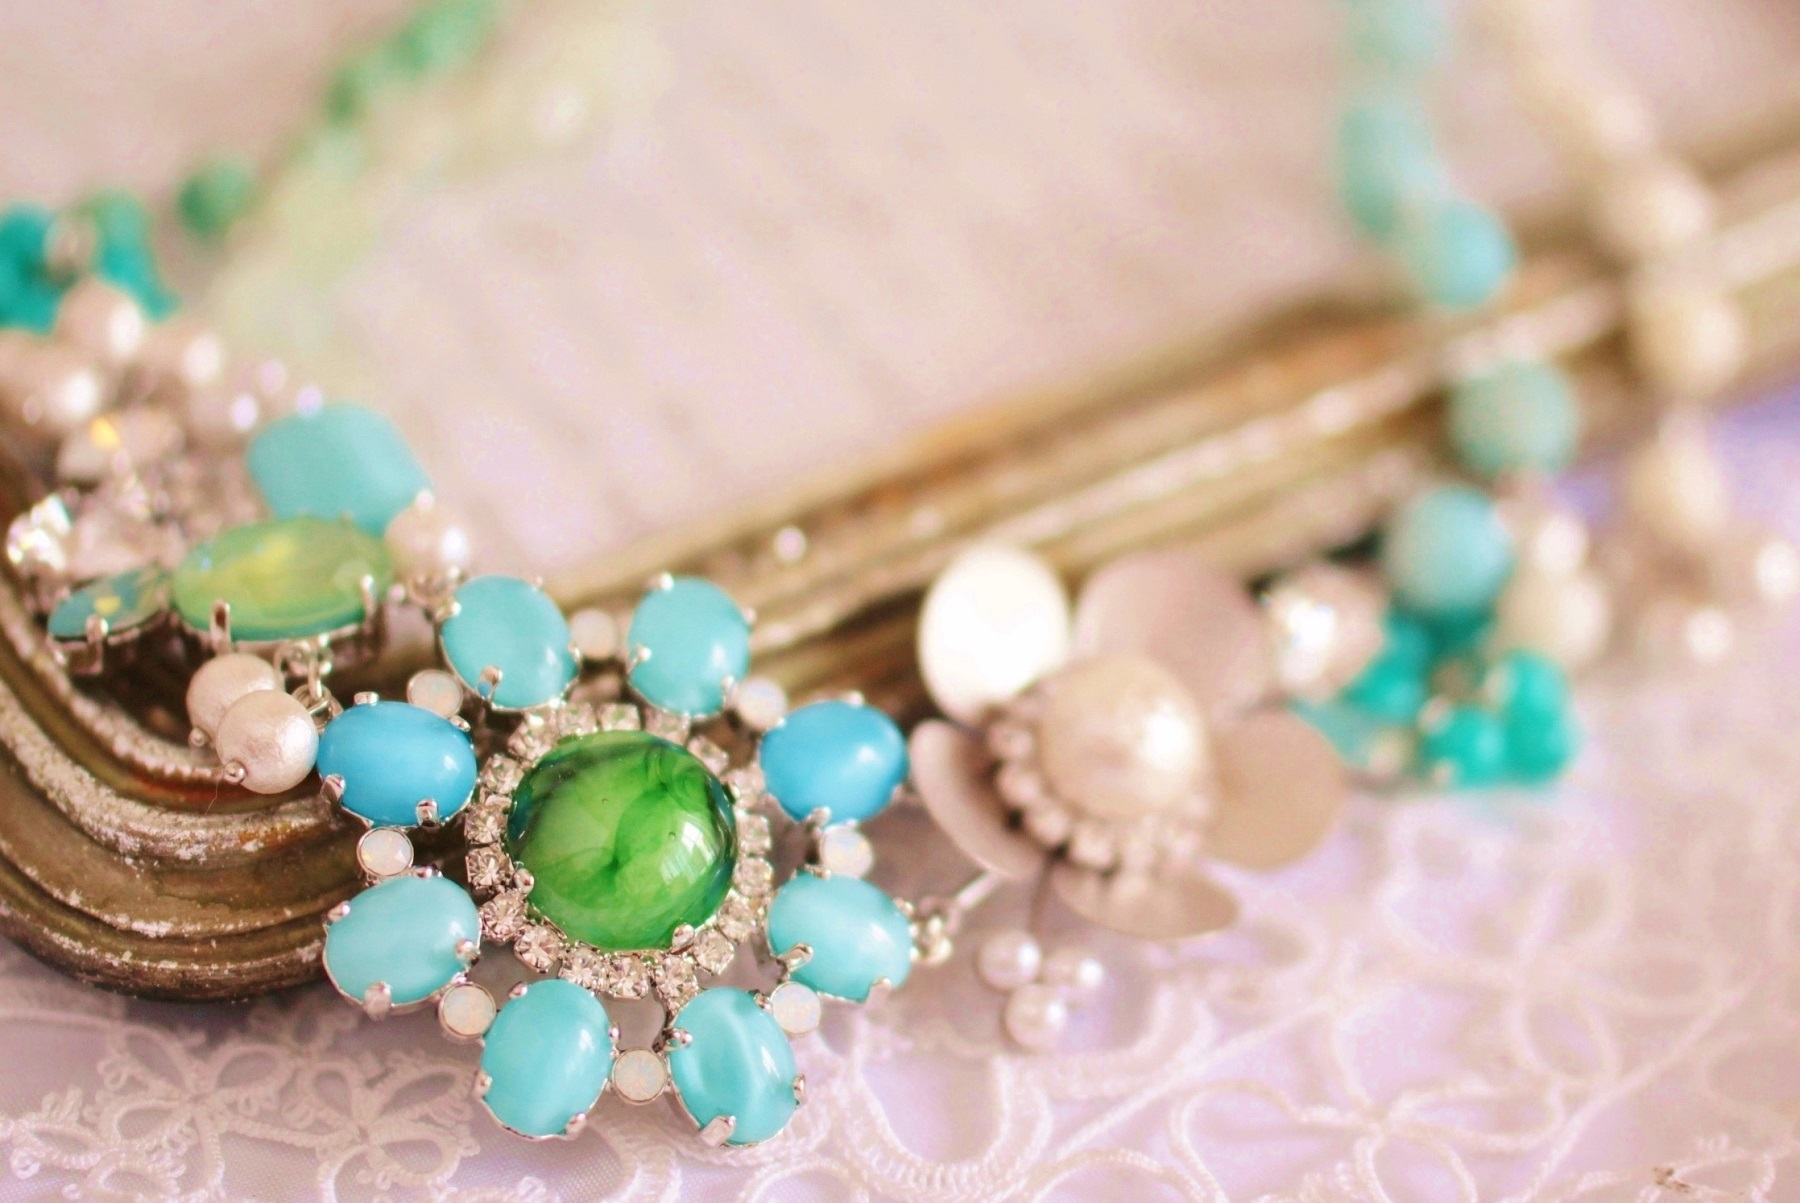 Emiko Watanabe collection